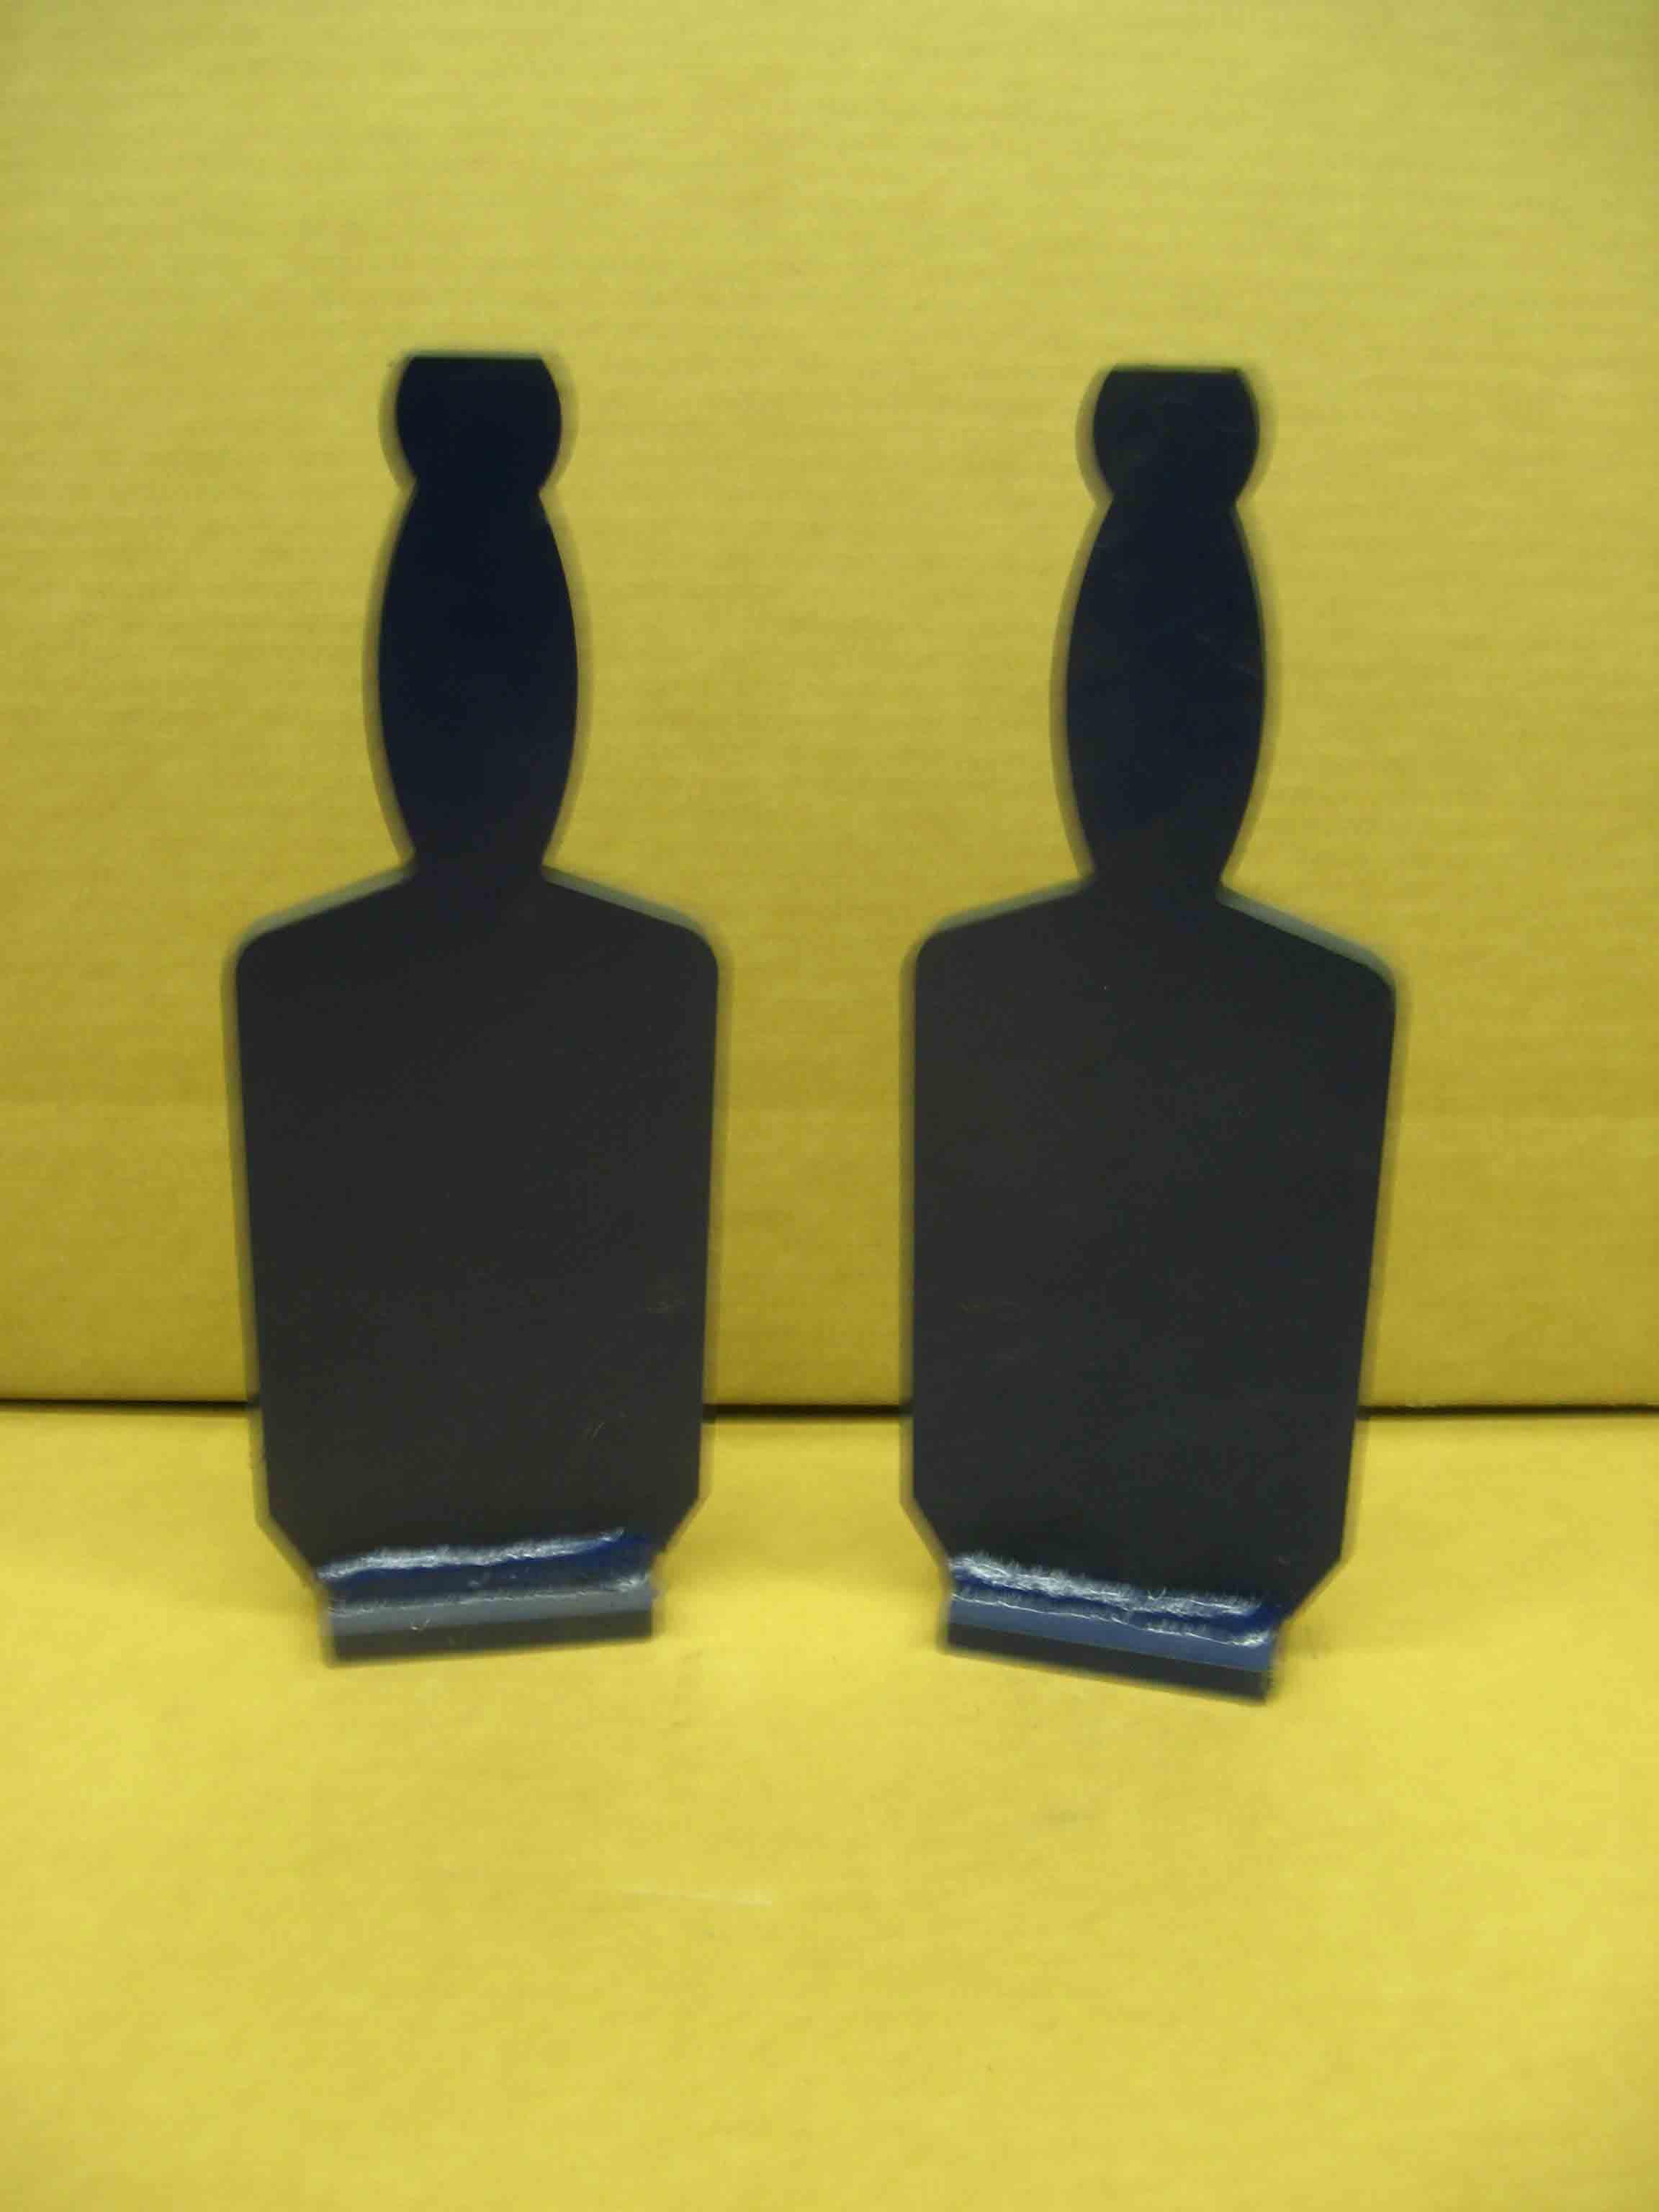 SASS Whiskey Bottle Target-Rifle*